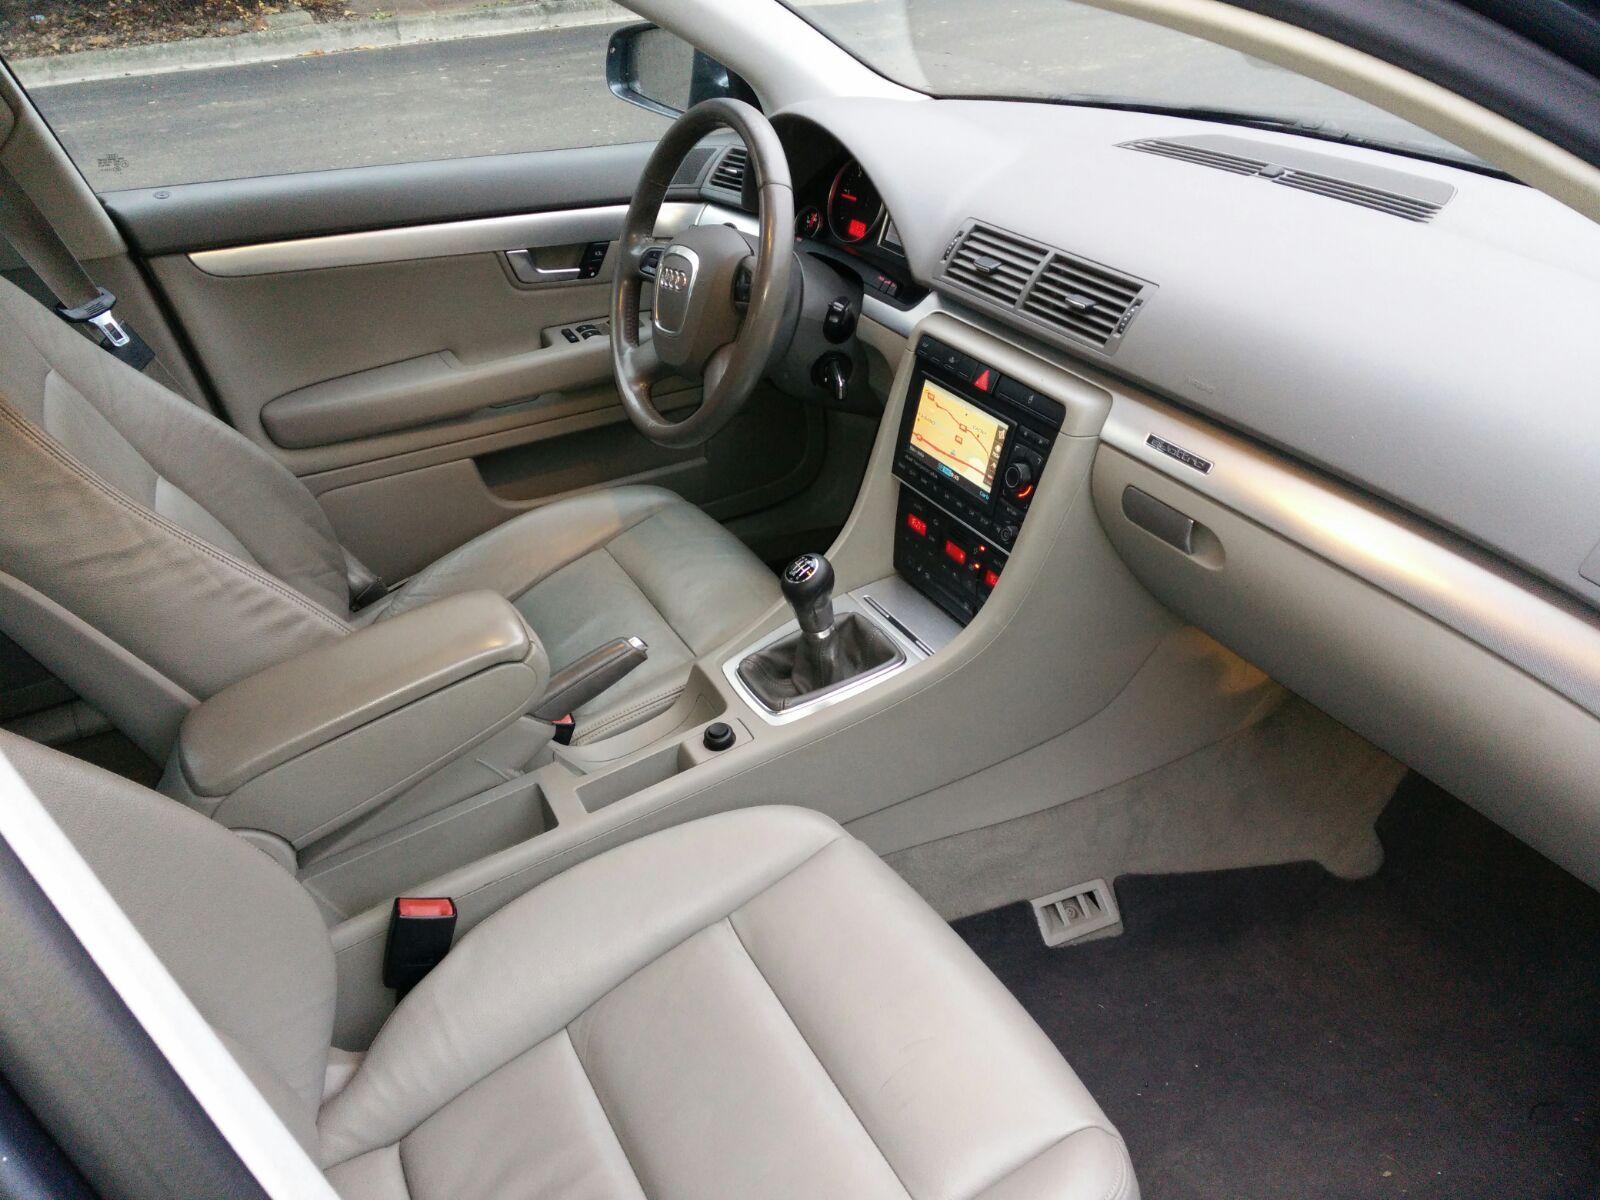 Audi a4 3 0 tdi 204 chevaux m y negoc 39 auto for Interieur a4 2000